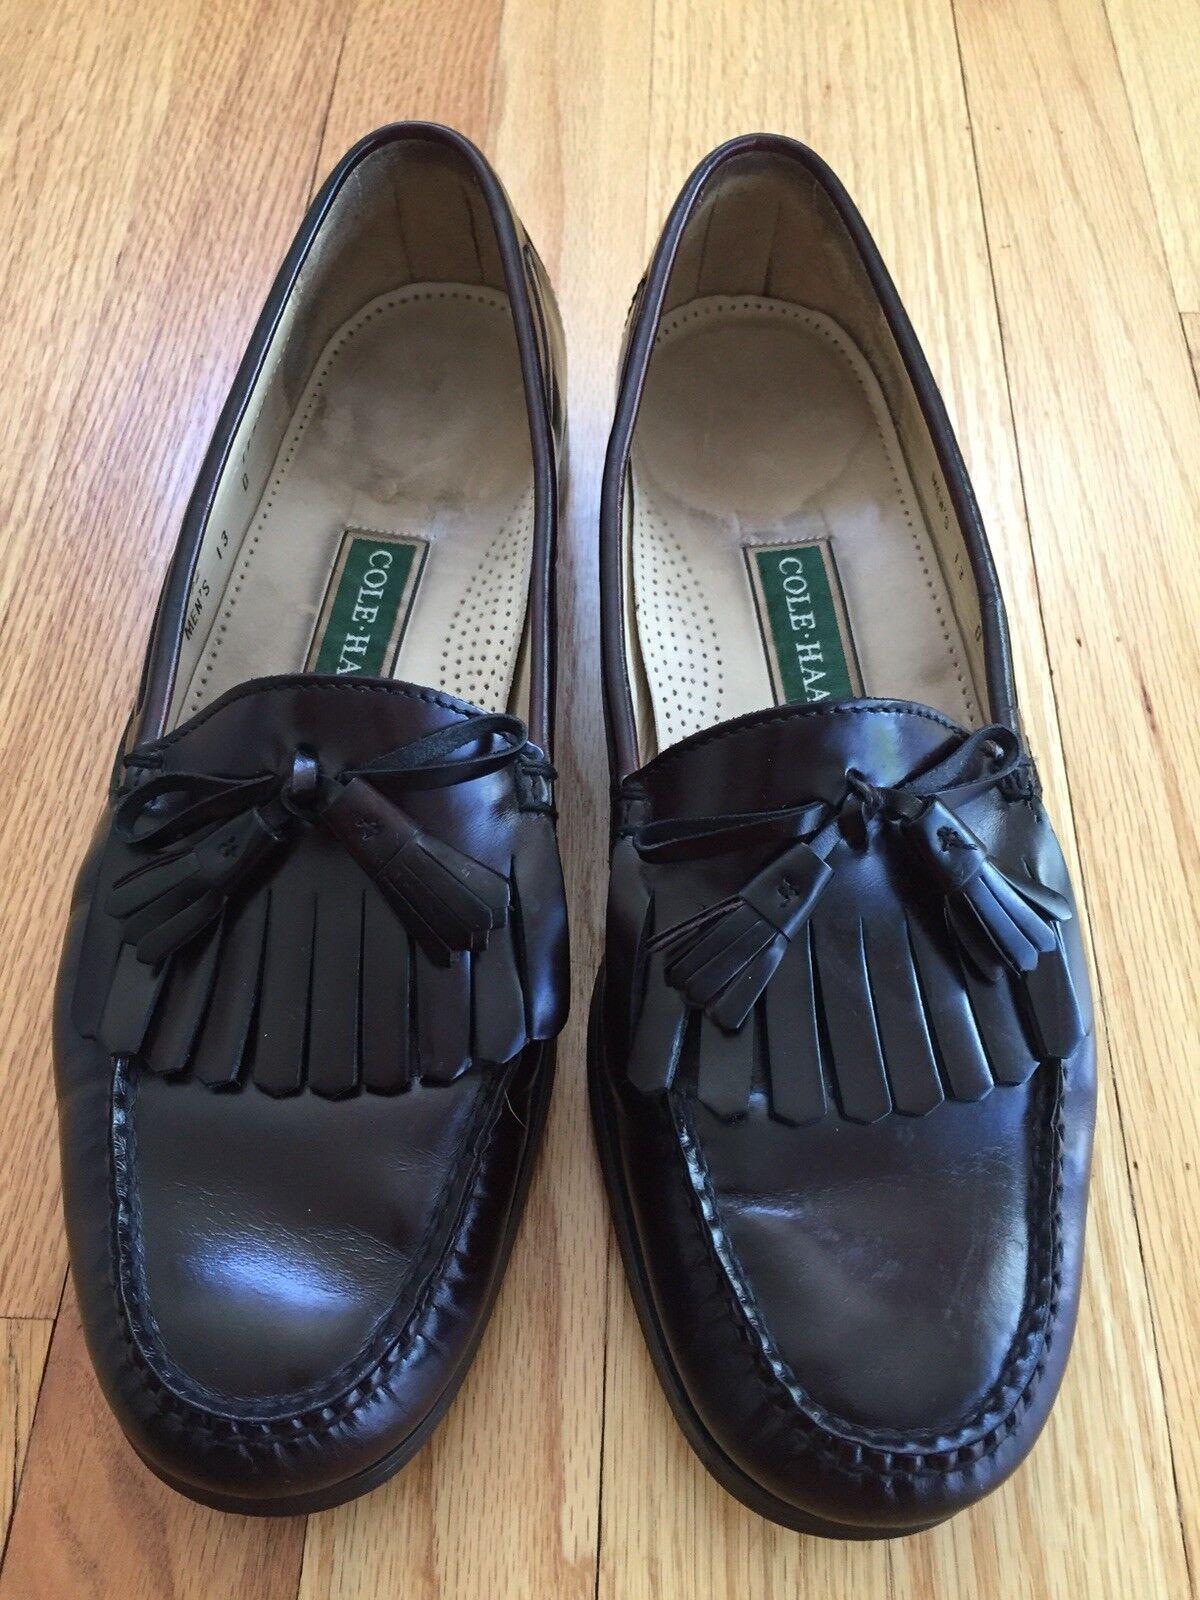 Cole Haan Burgundy Leather Kilt Bow Tassel Moc Toe Loafer shoes Mens 13 D Casual